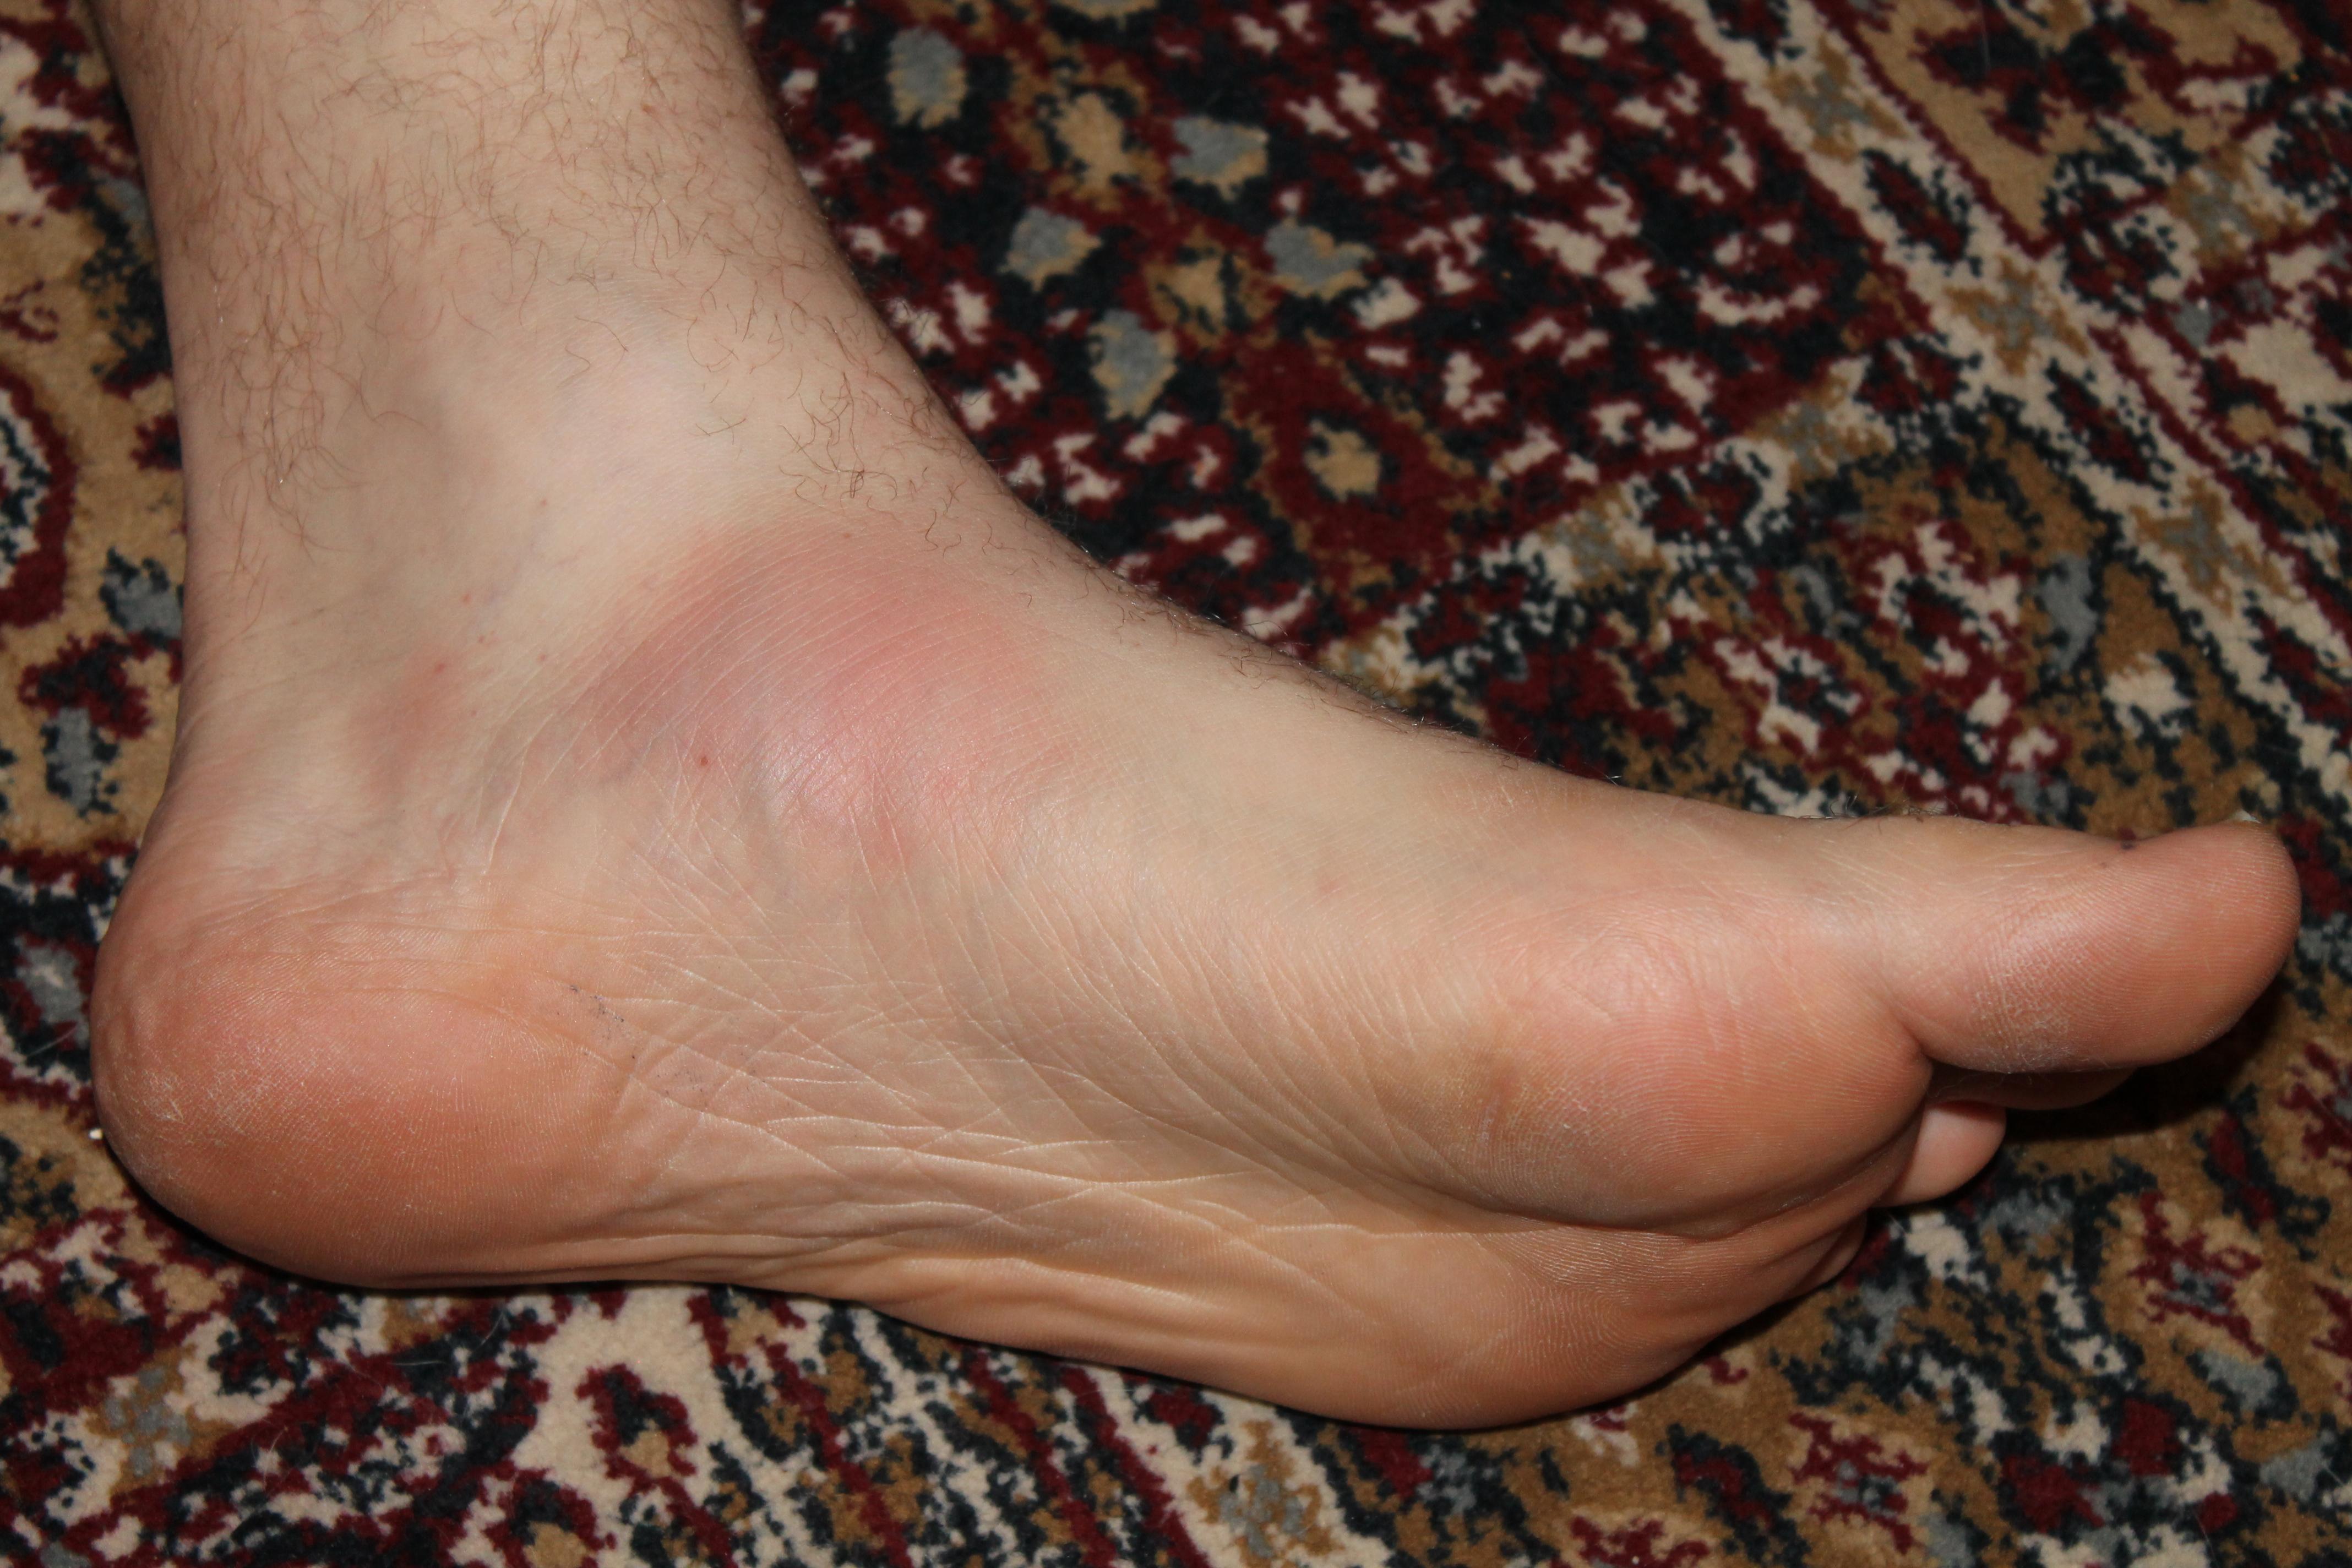 Arch in foot swollen